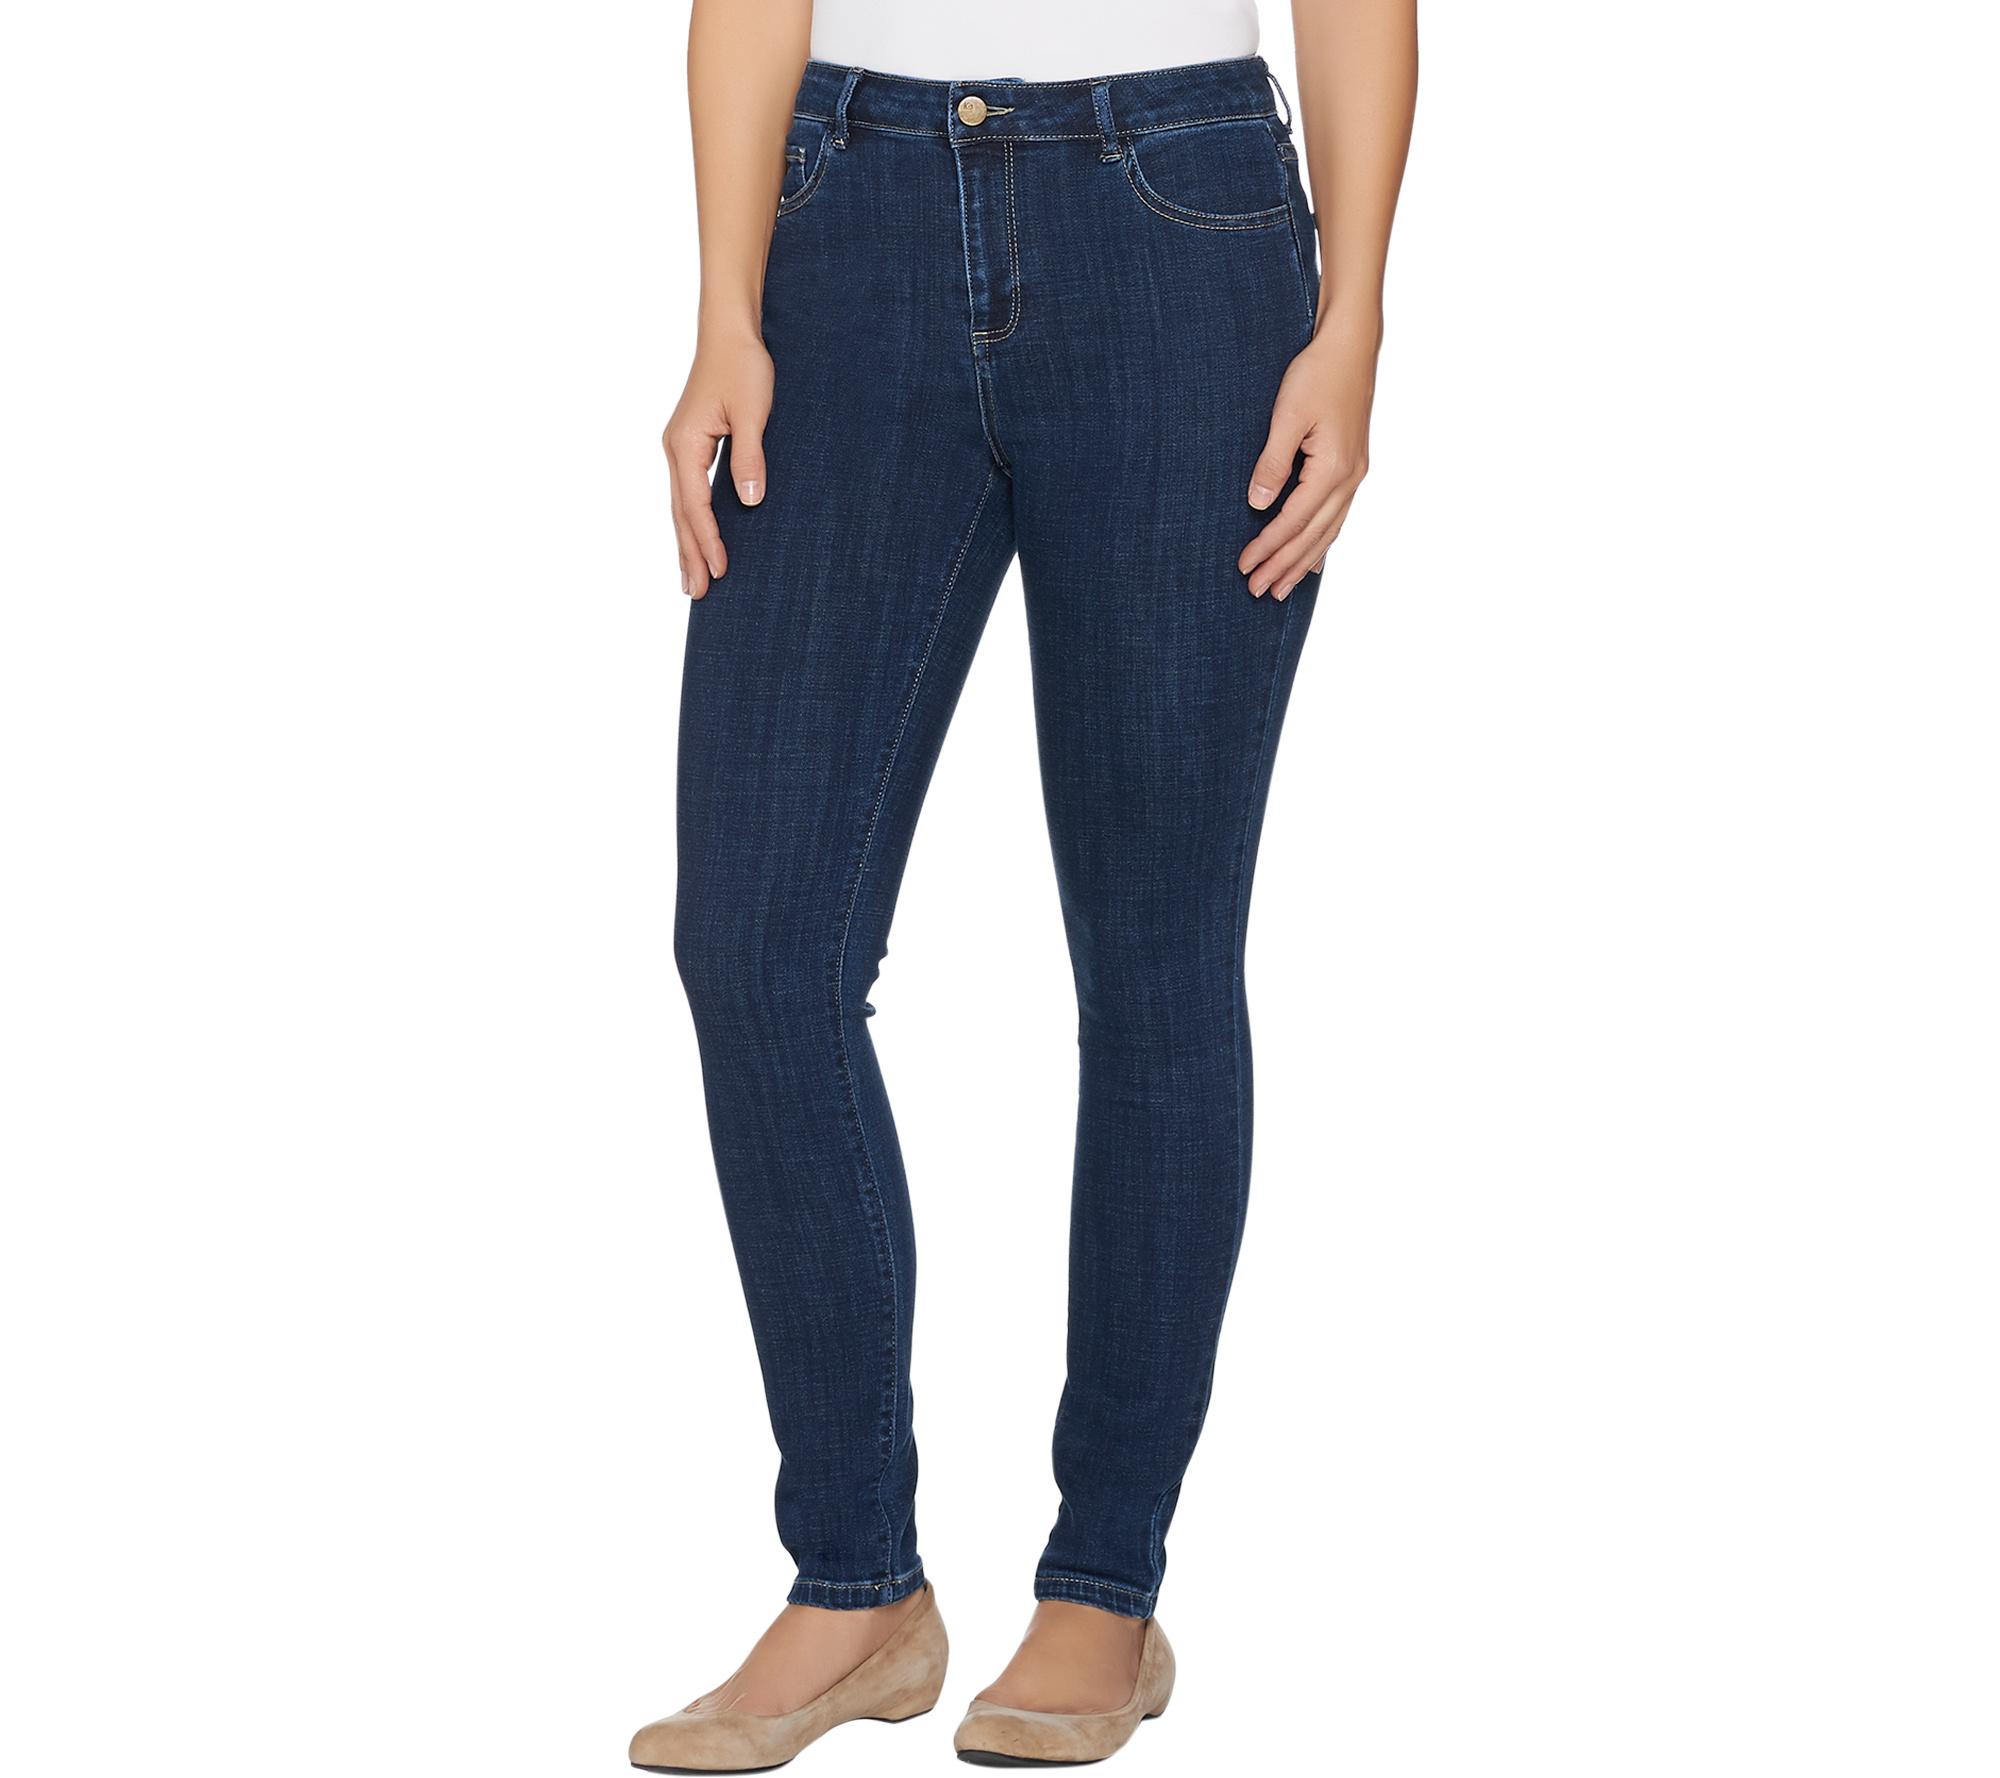 LOGO by Lori Goldstein Regular 5-Pocket Skinny Jeans - Page 1 ...